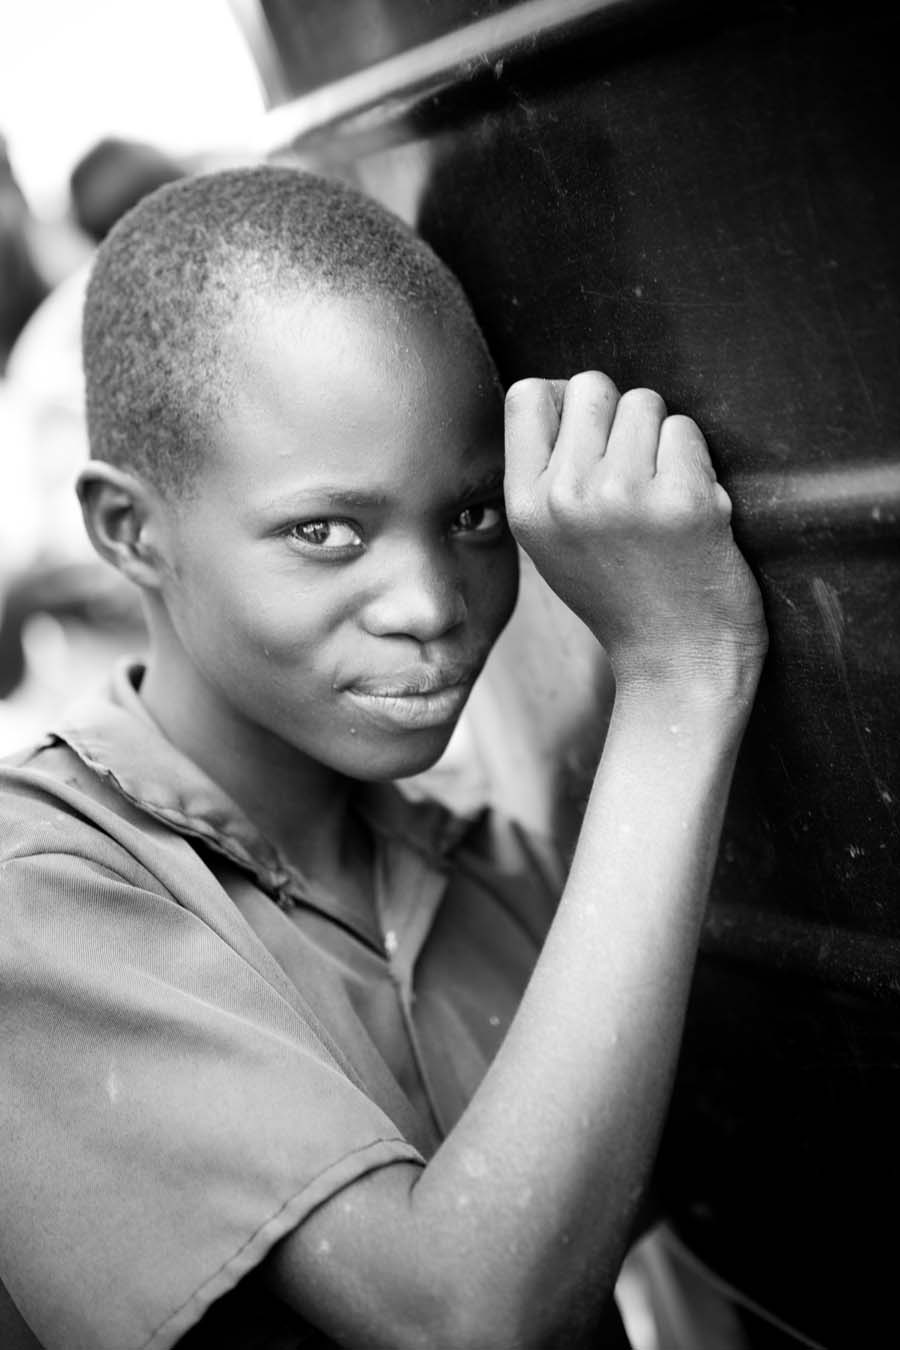 jessicadavisphotography.com | Jessica Davis Photography | Portrait Work in Uganda| Travel Photographer | World Event Photographs 4 (1).jpg